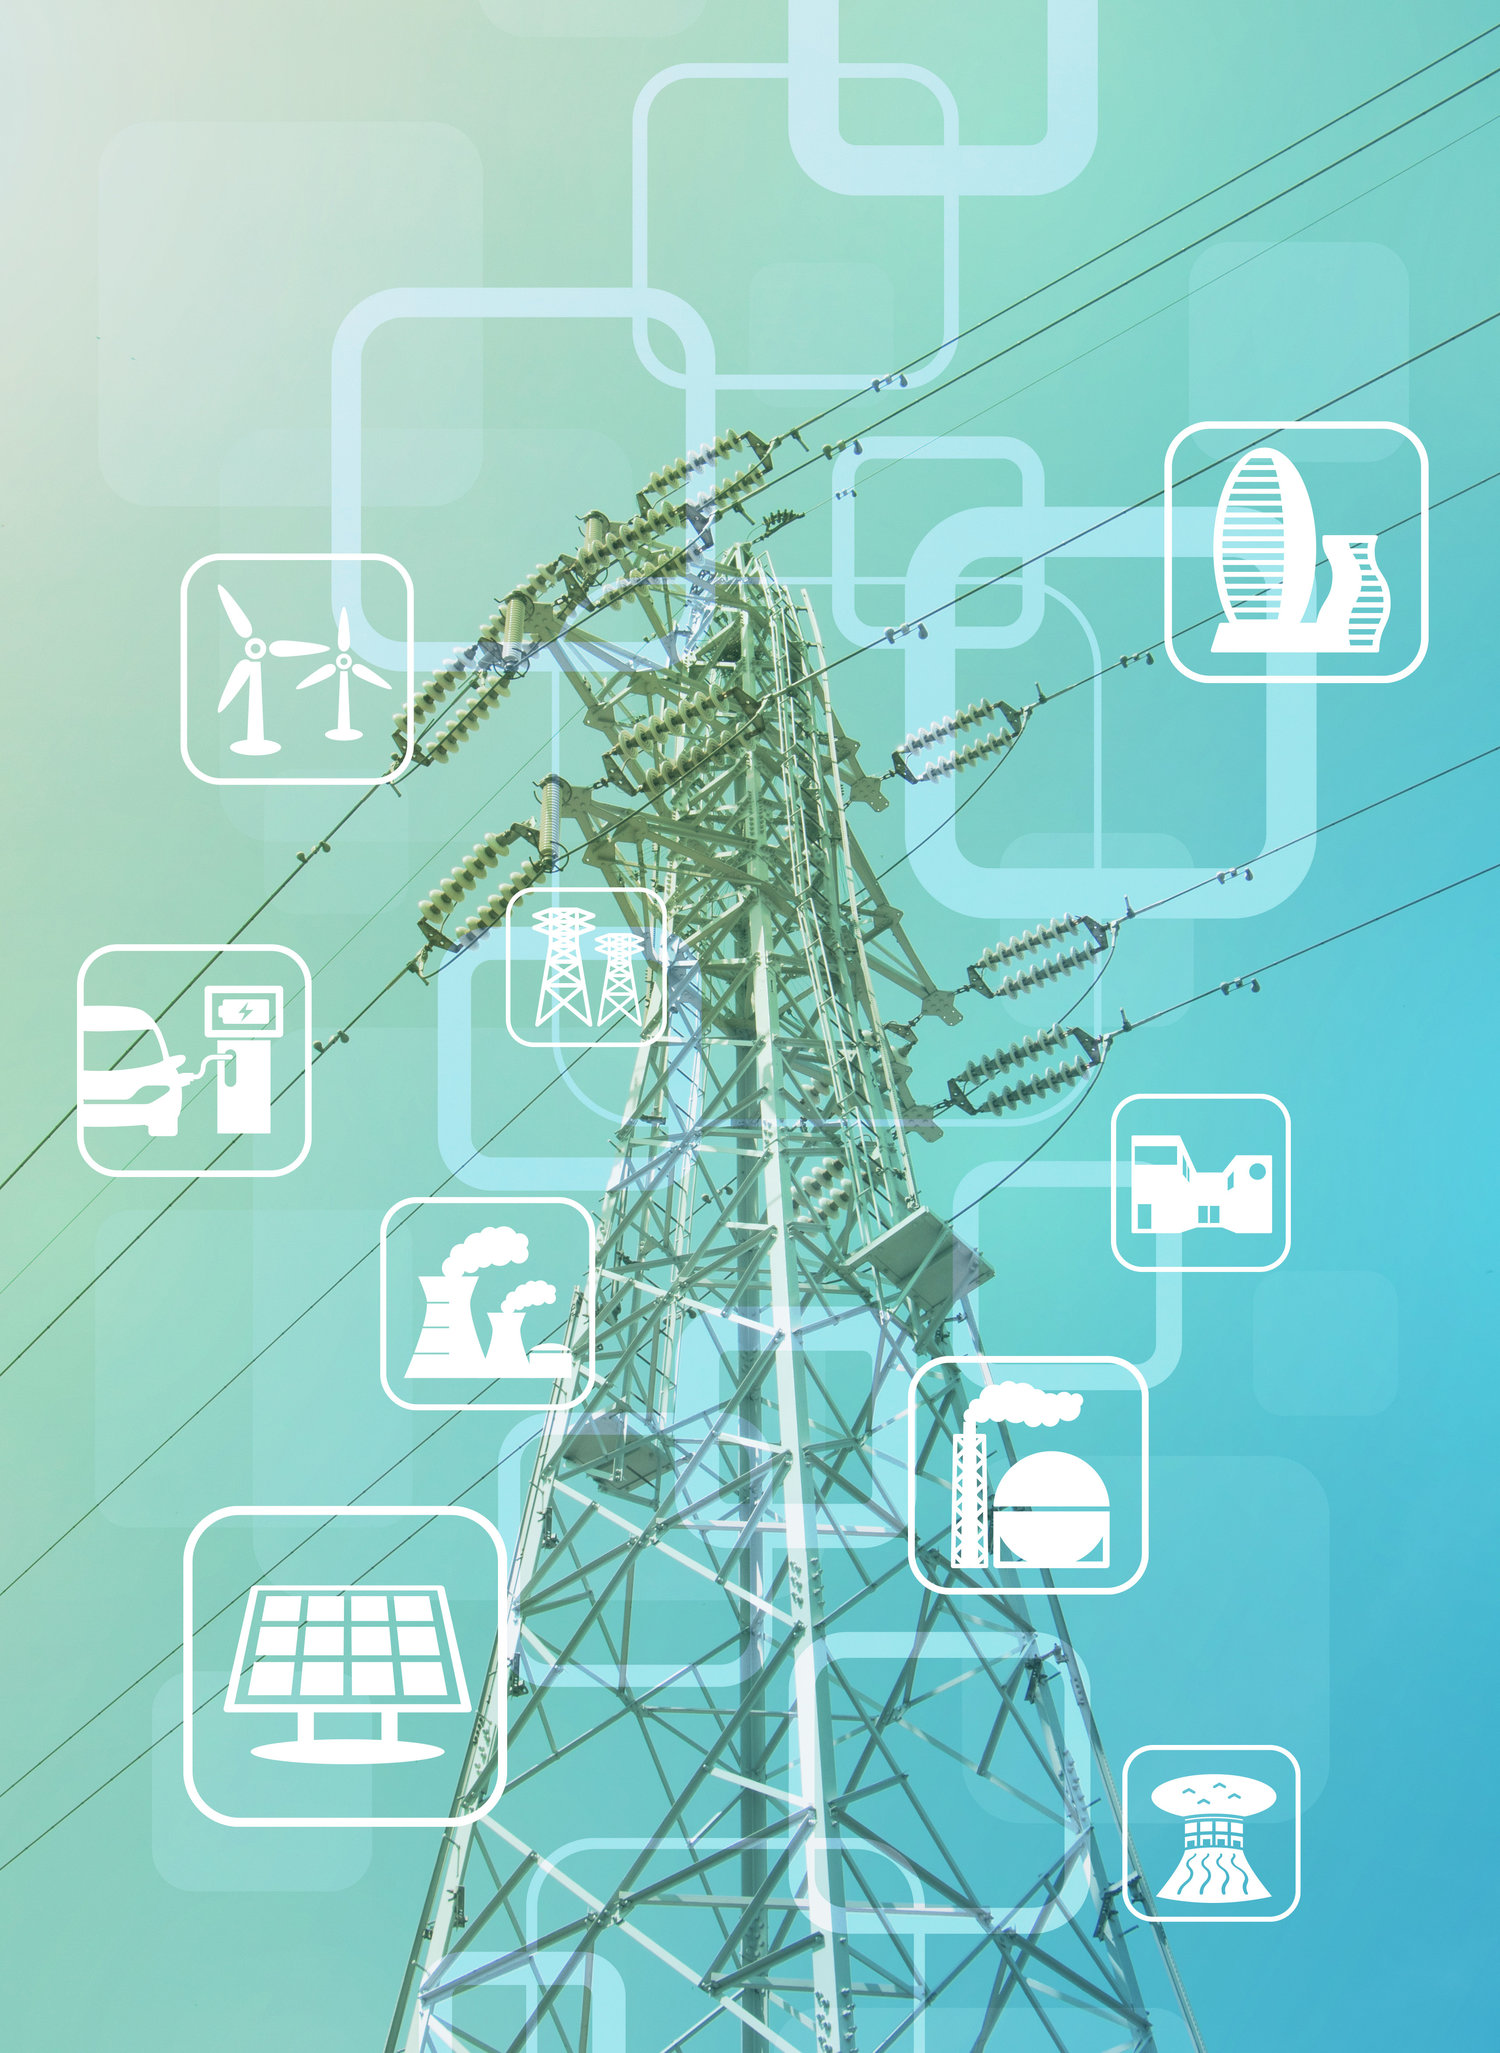 Energetics Supports Regional Smart Grid Interoperability